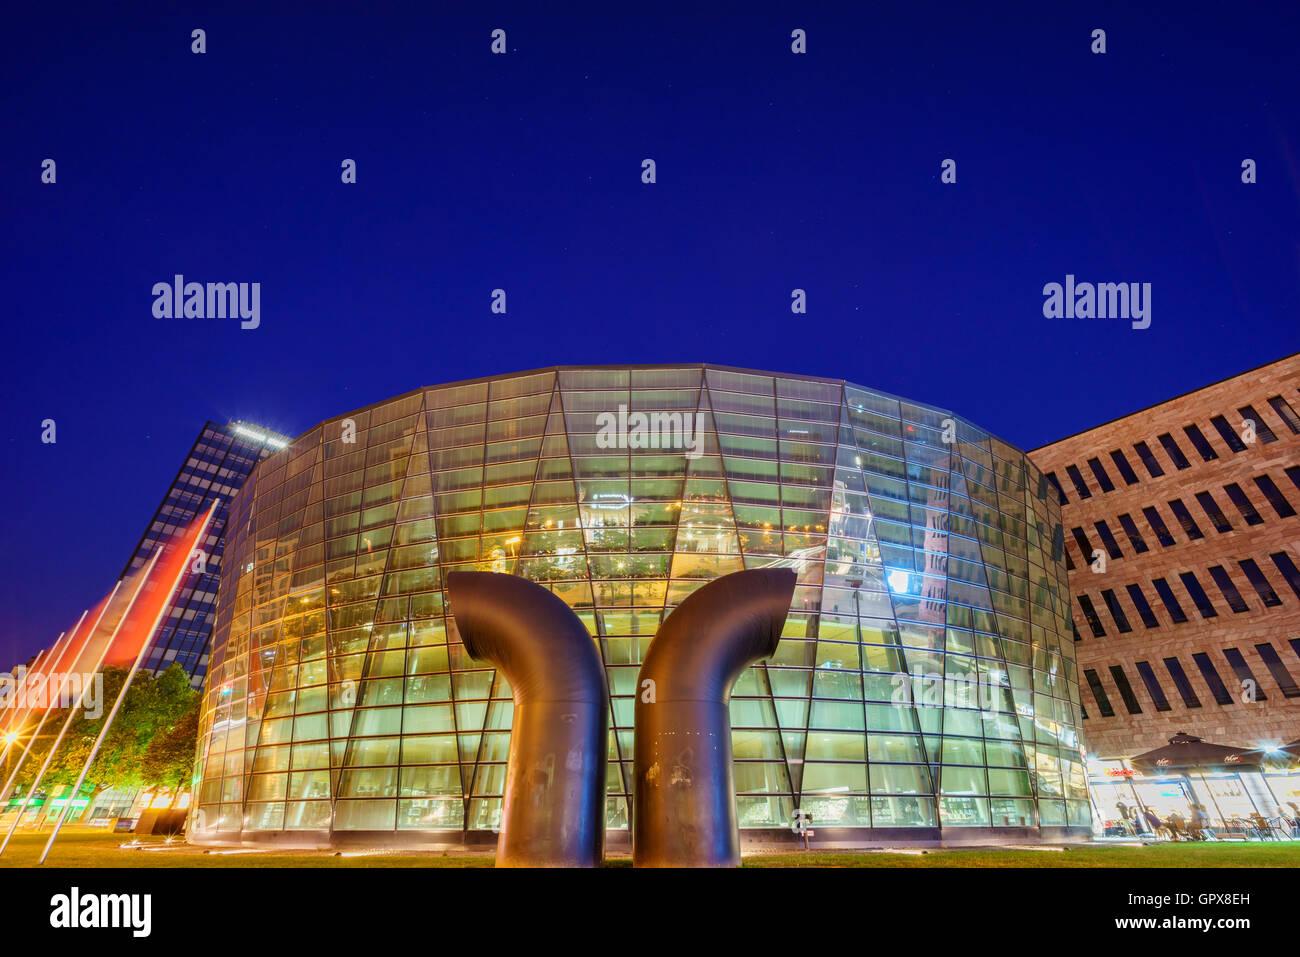 Dortmund, AUG 31: The beautiful Stadt- und Landesbibliothek Dortmund at night on AUG 31, 2016 at Dortmund, Germany - Stock Image